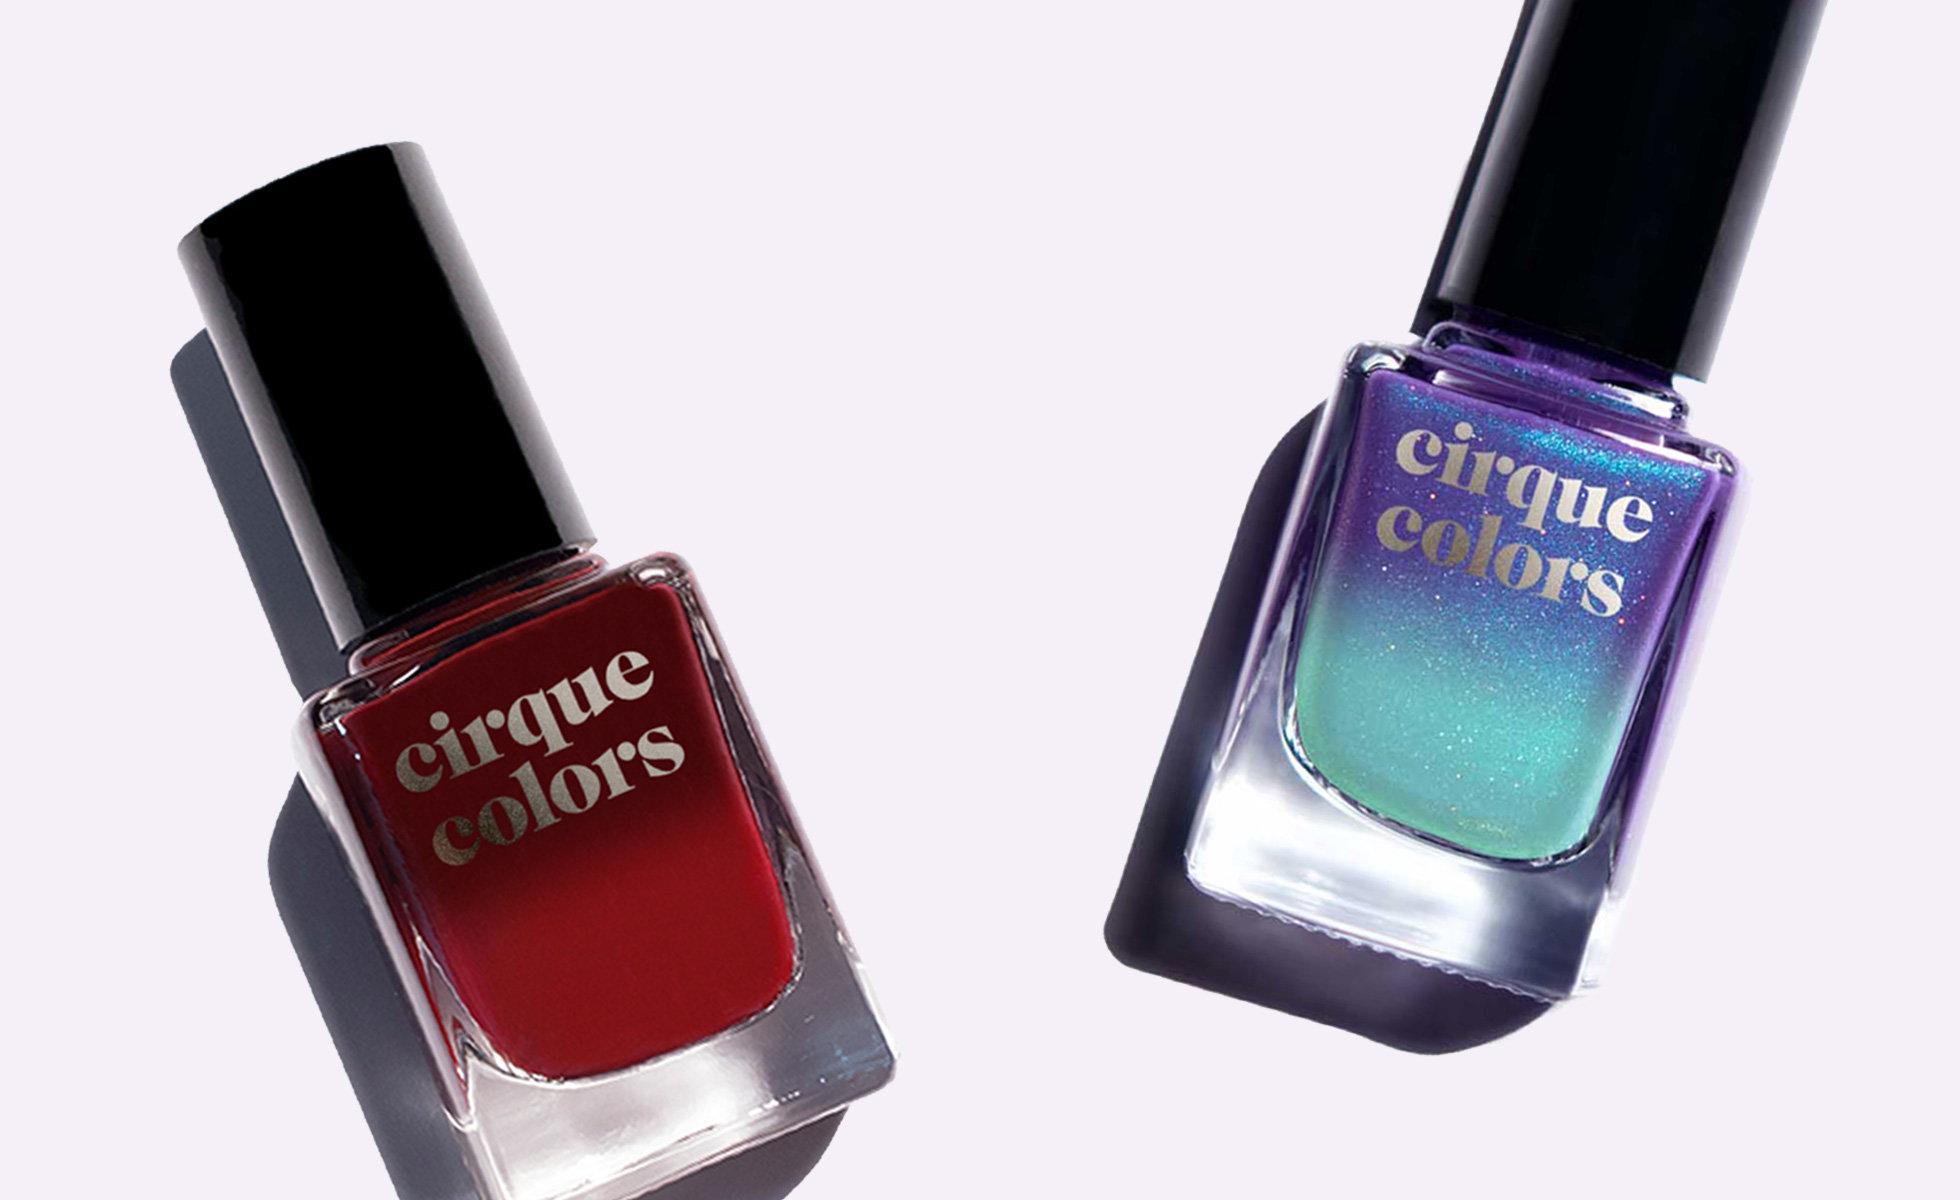 Cirque Colors Thermal Nail Polish in shades Rothko Red and Luna (Photo: Cirque Colors)